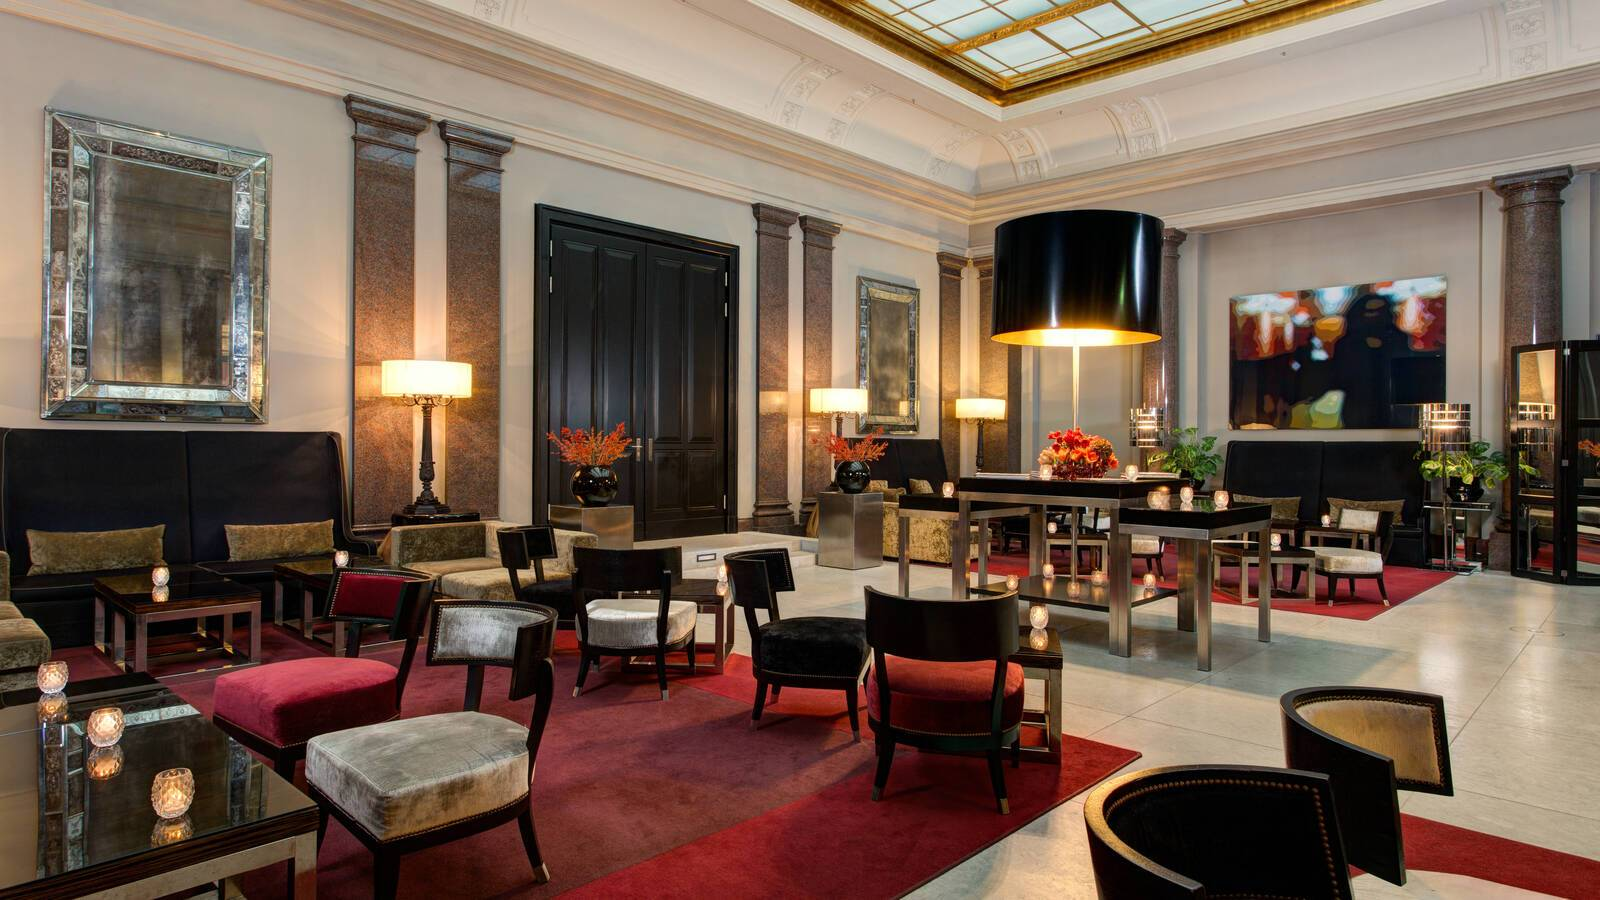 Hotel de Rome Berlin Rocco Forte Lobby